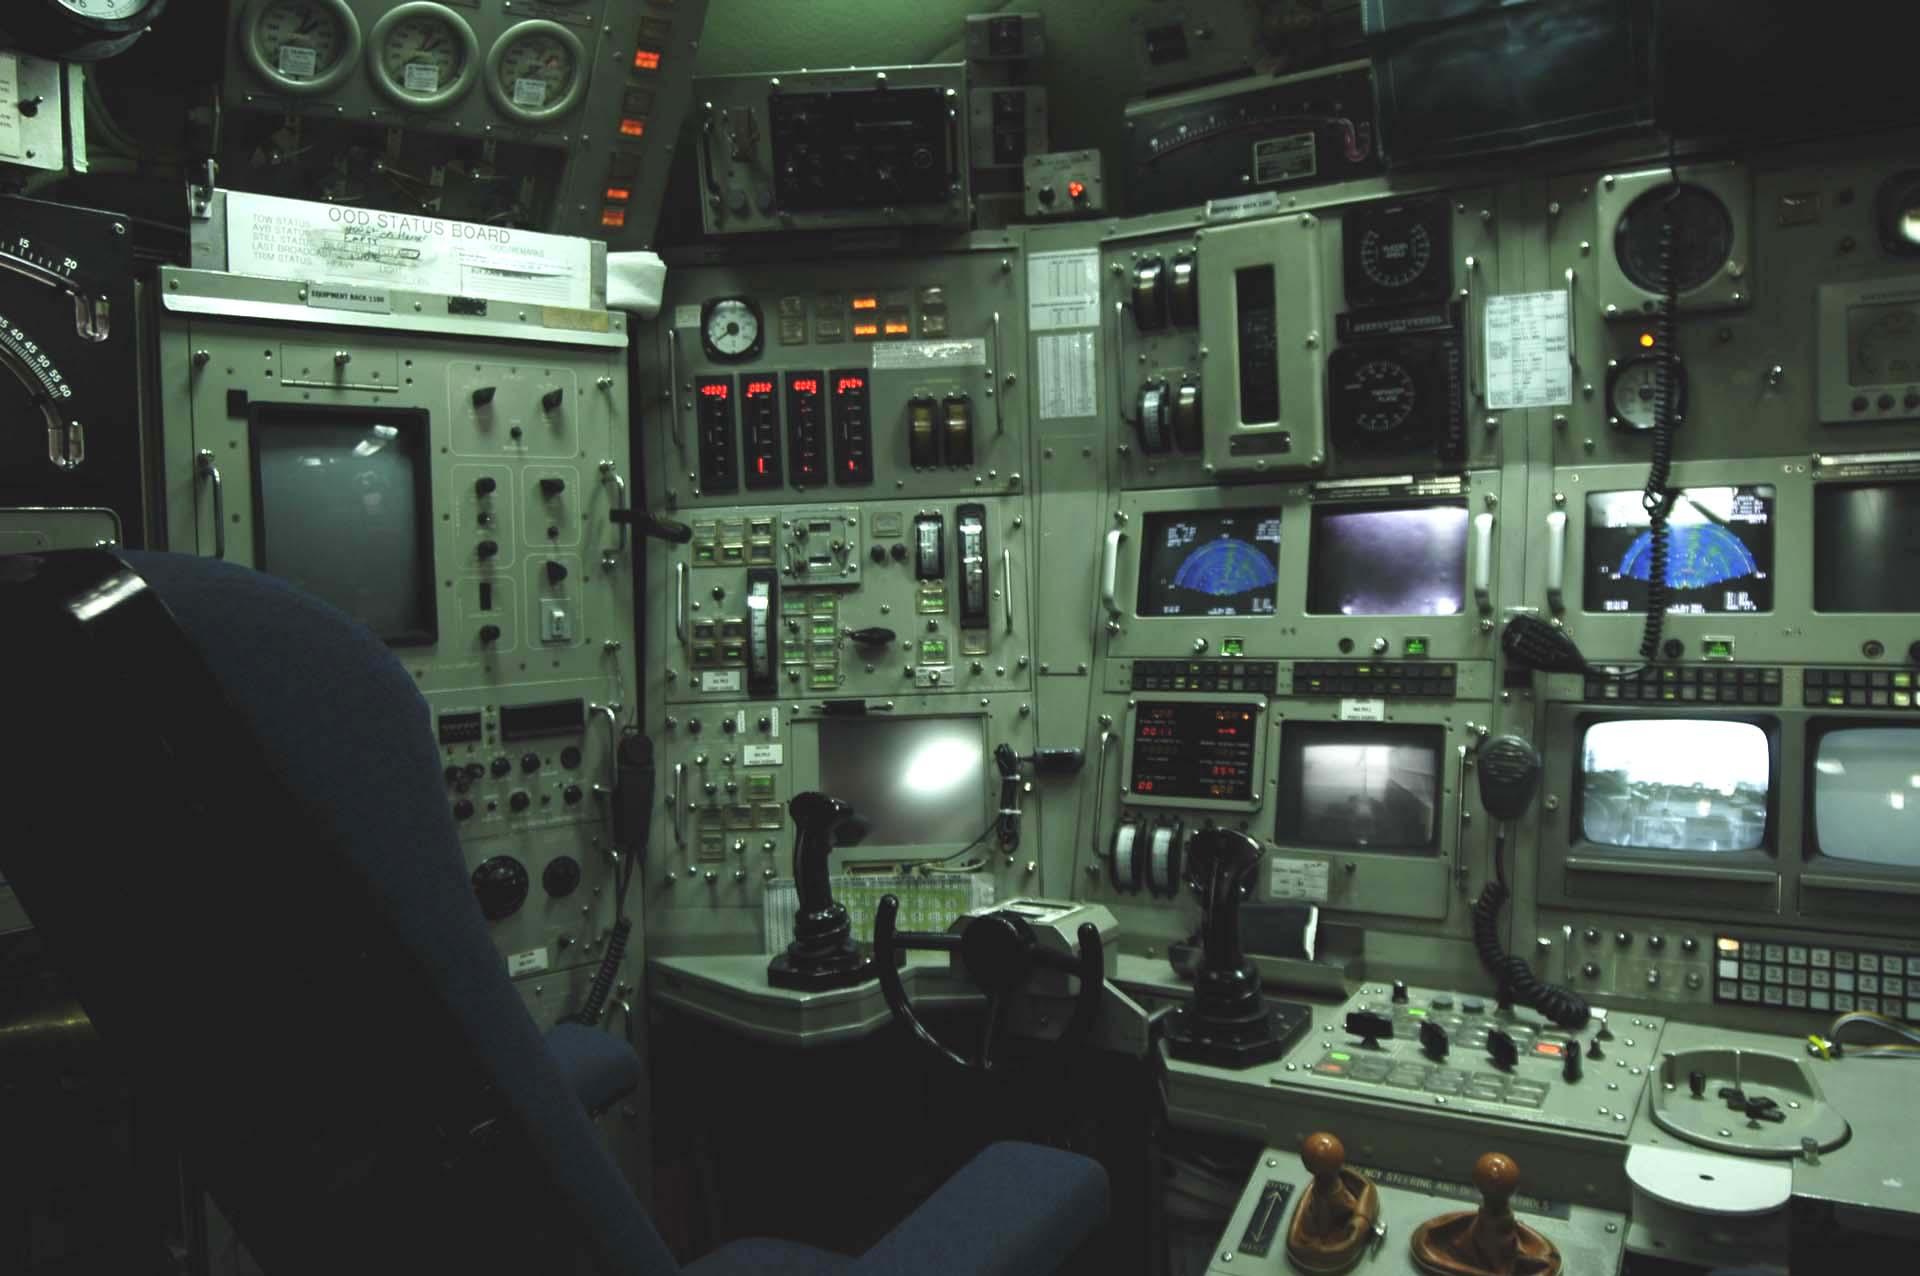 Los submarinos de investigaci n s per secretos que for Interior submarino